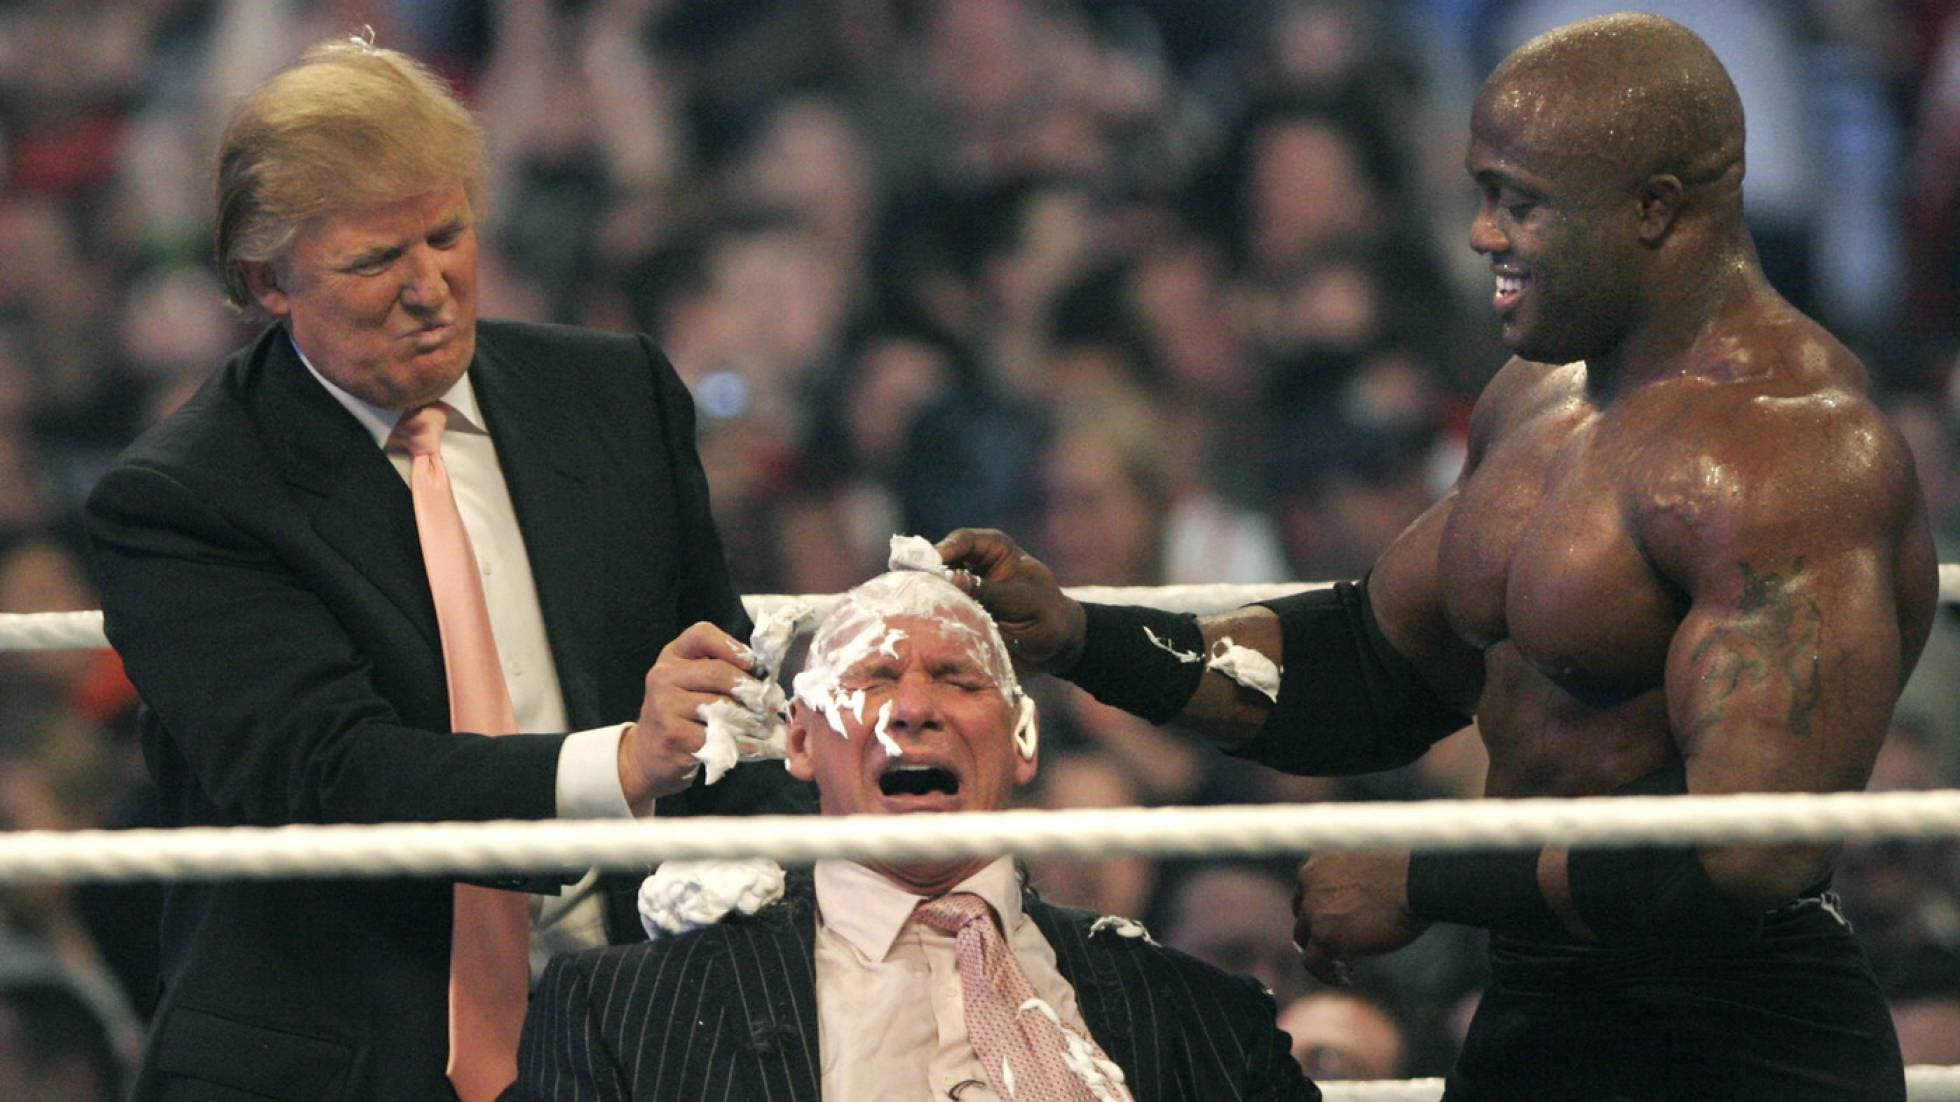 Vince machone se afeita la cabeza